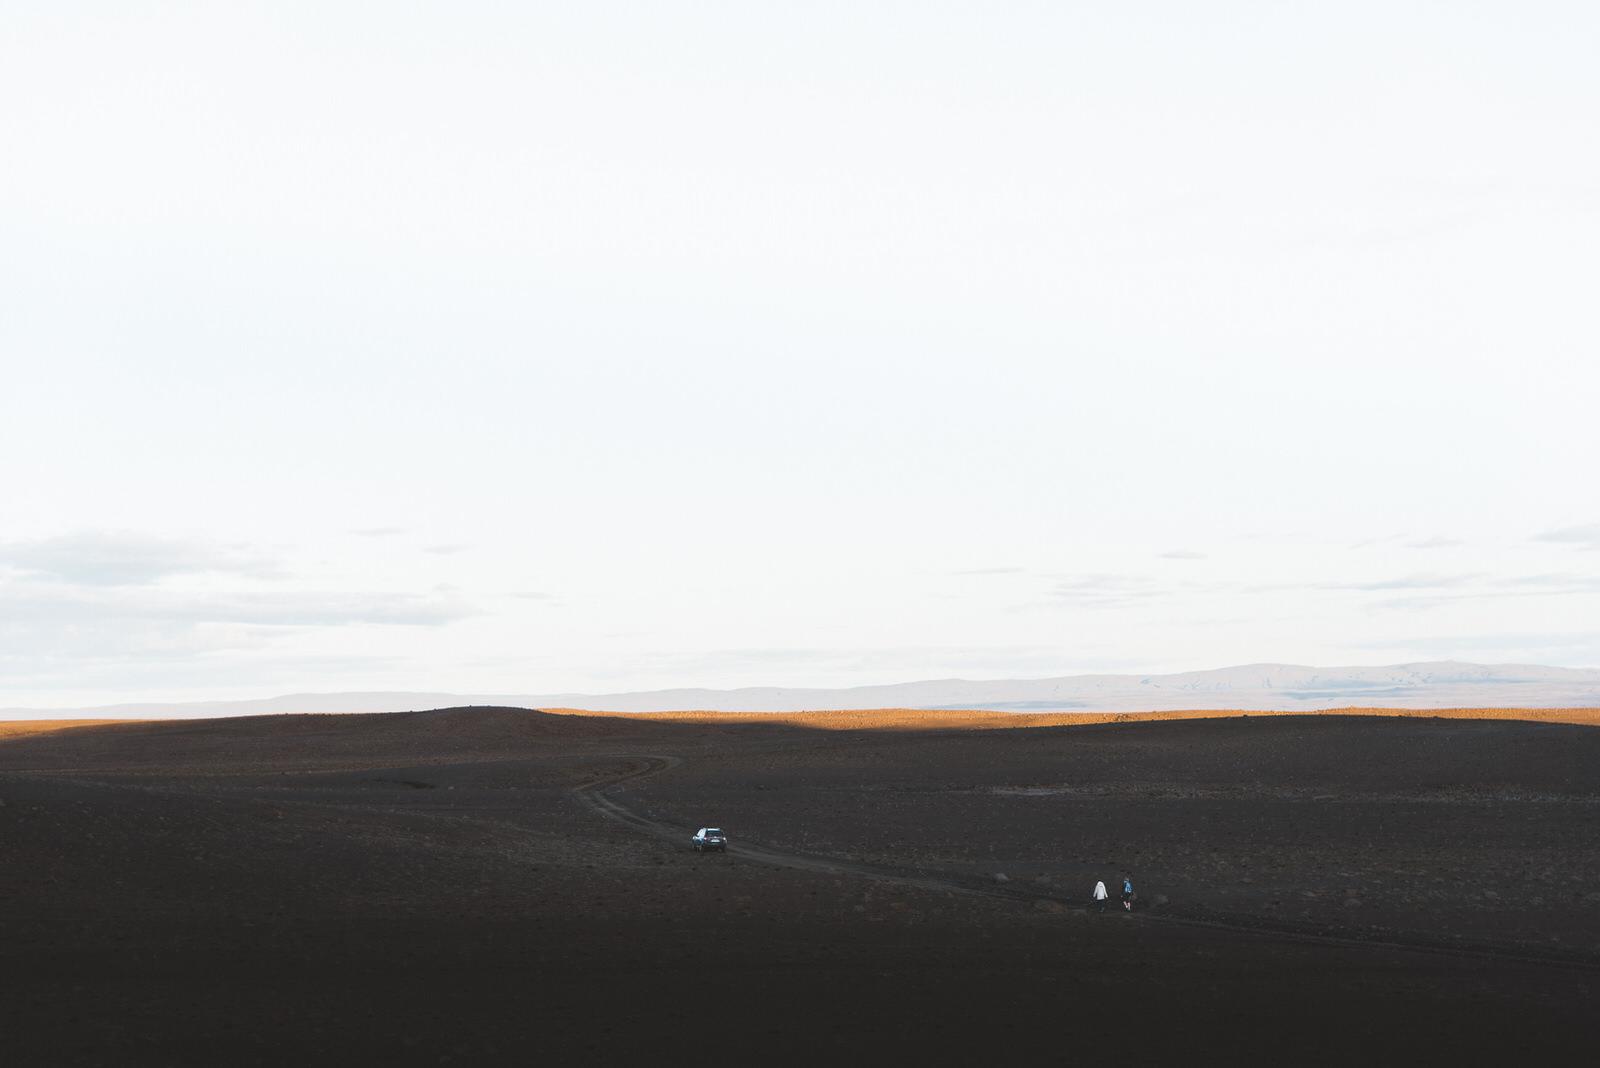 iceland road trip day 6 - geysir hagavatn gullfoss aurora